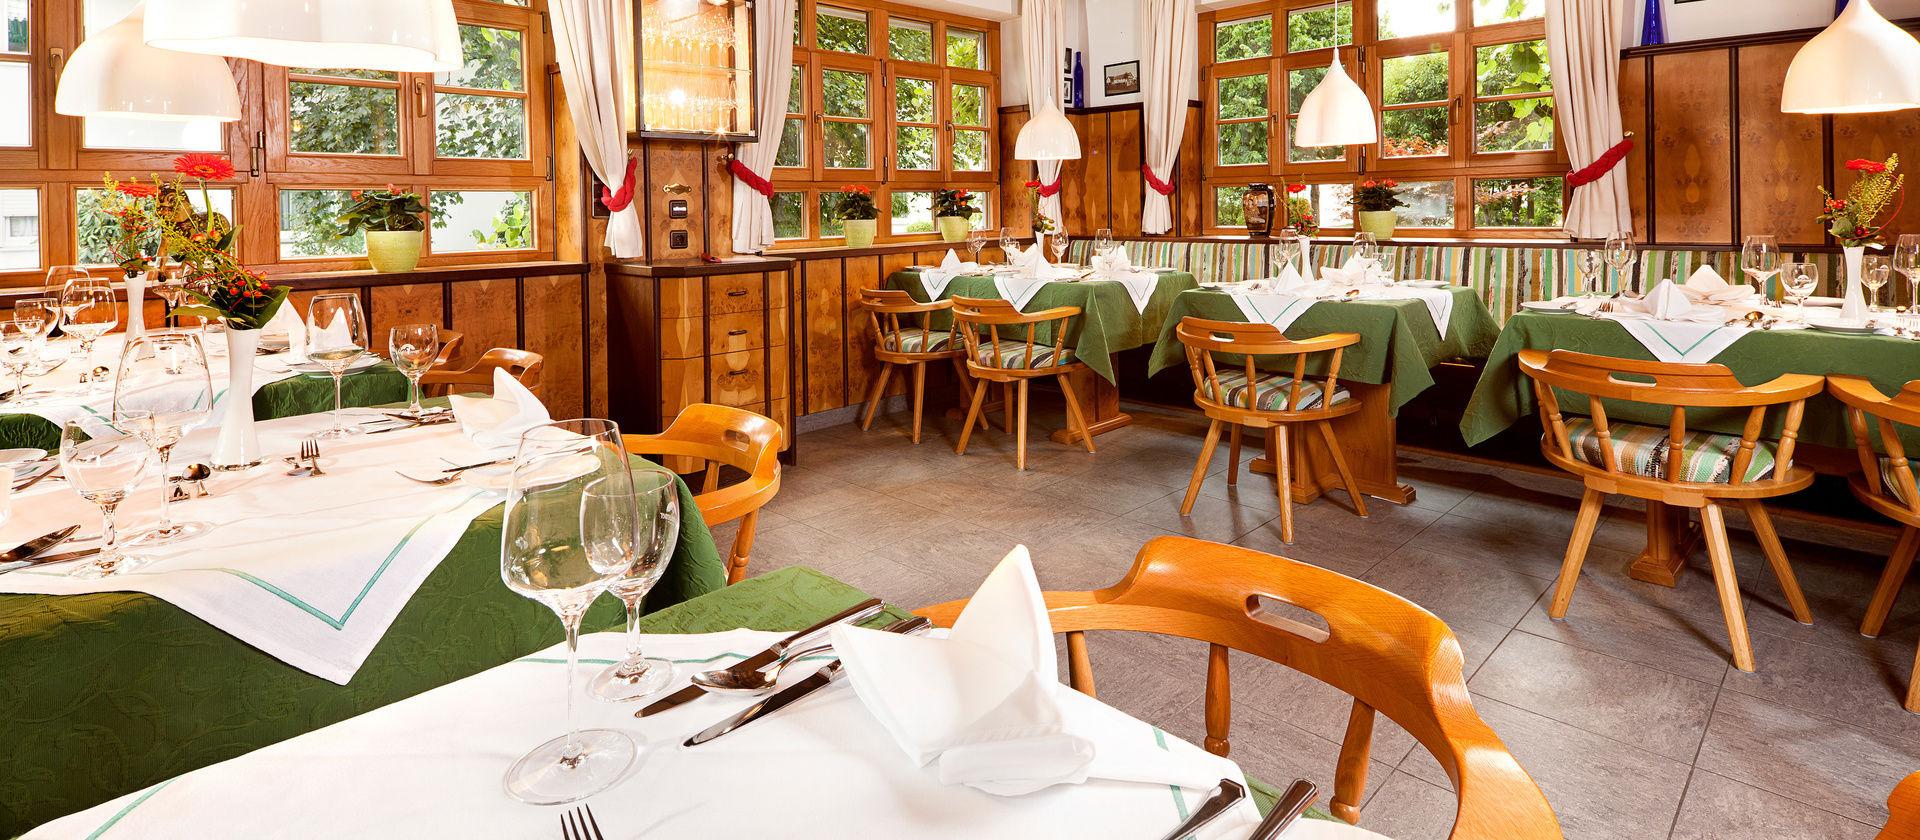 Impressum 4 Sterne Hotel Wellnesshotel Edelweiss Bad